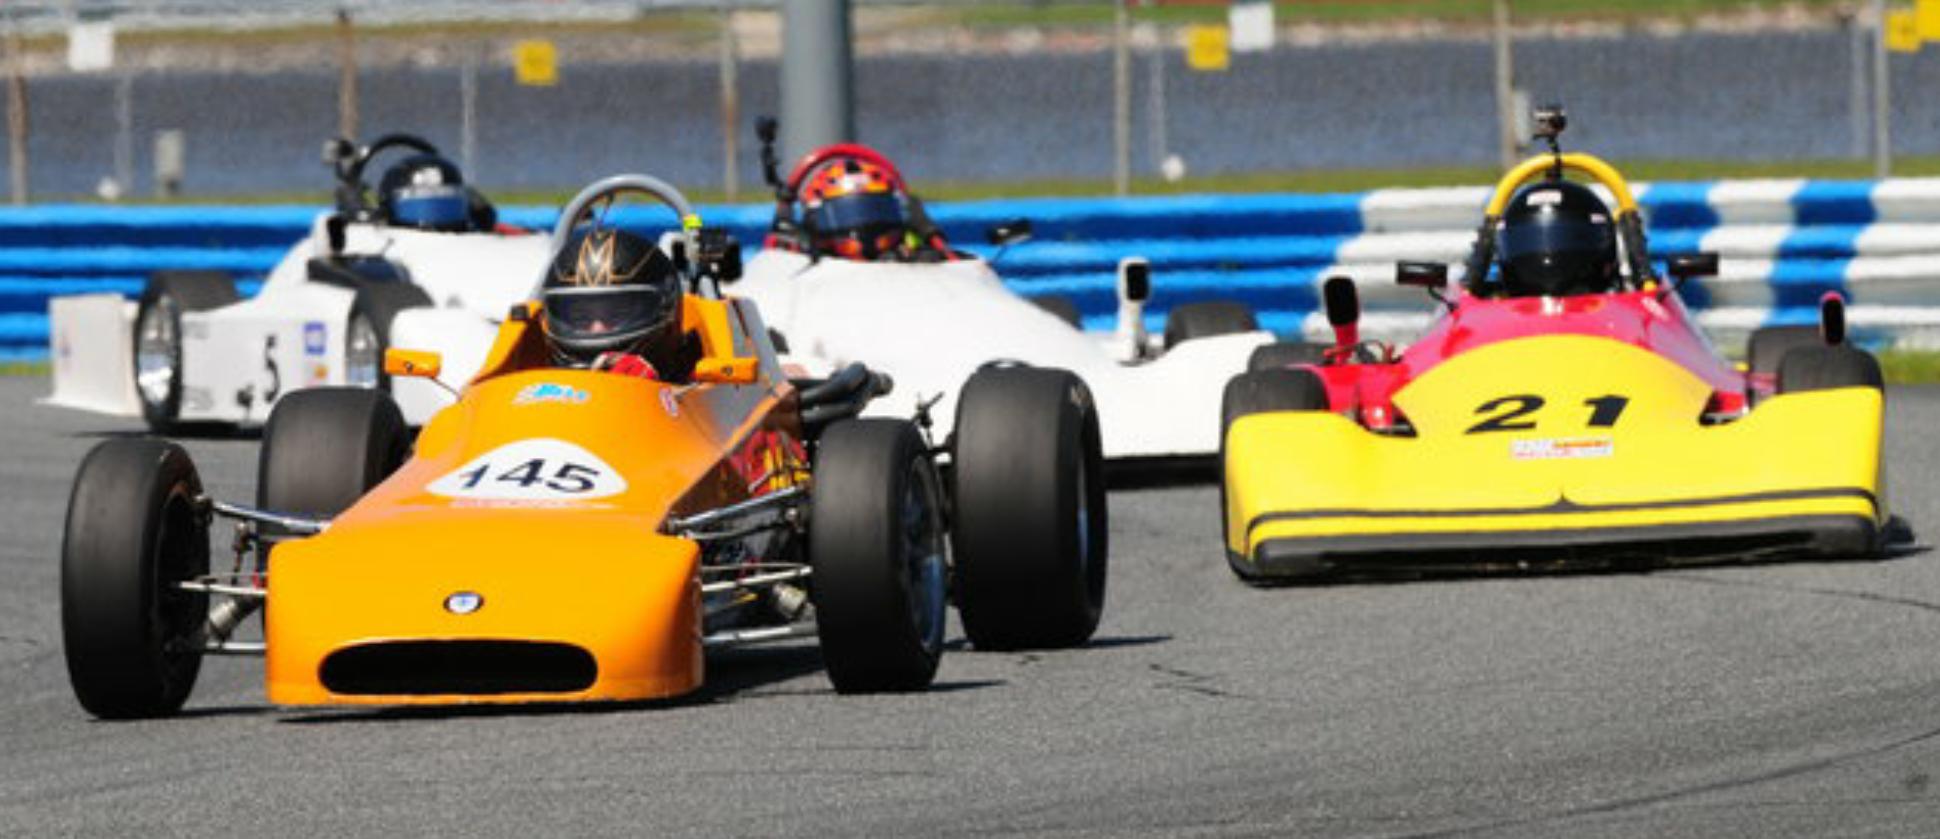 formula cars sher edited